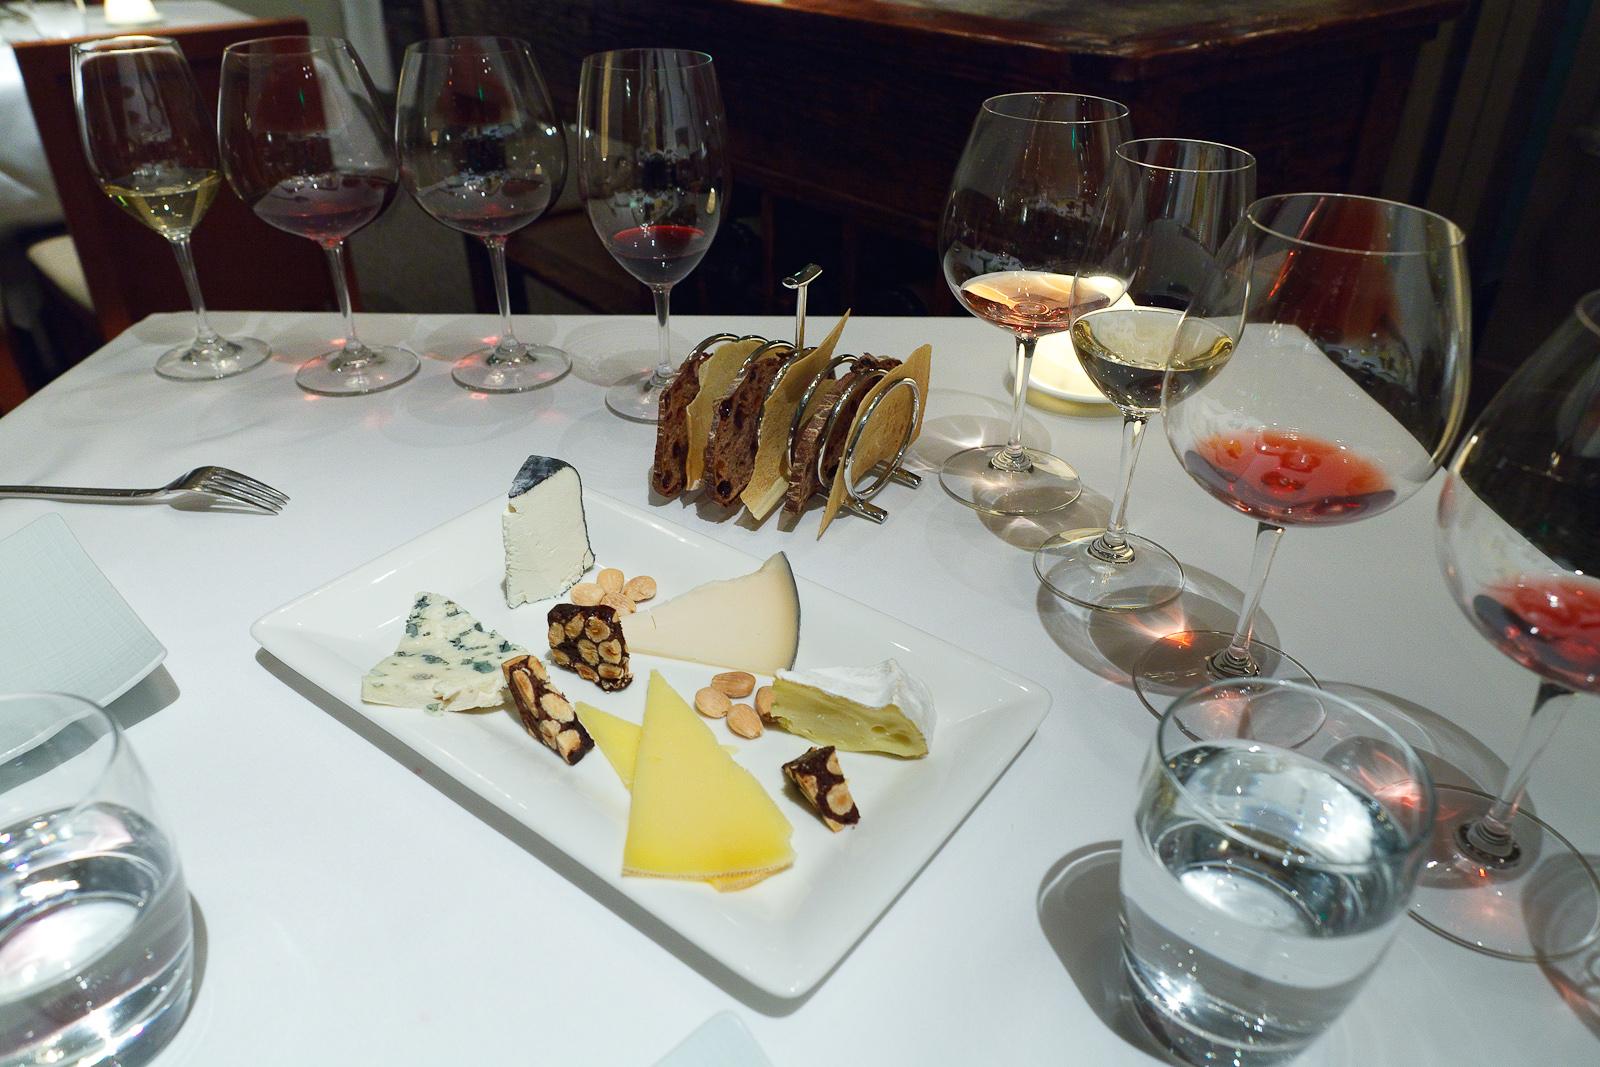 Cheese course: Roquefort, Chevrière cendre (concord grape ash), Gouda-style Midnight moon, Cow's milk Pleasant ridge reserve, Bent River